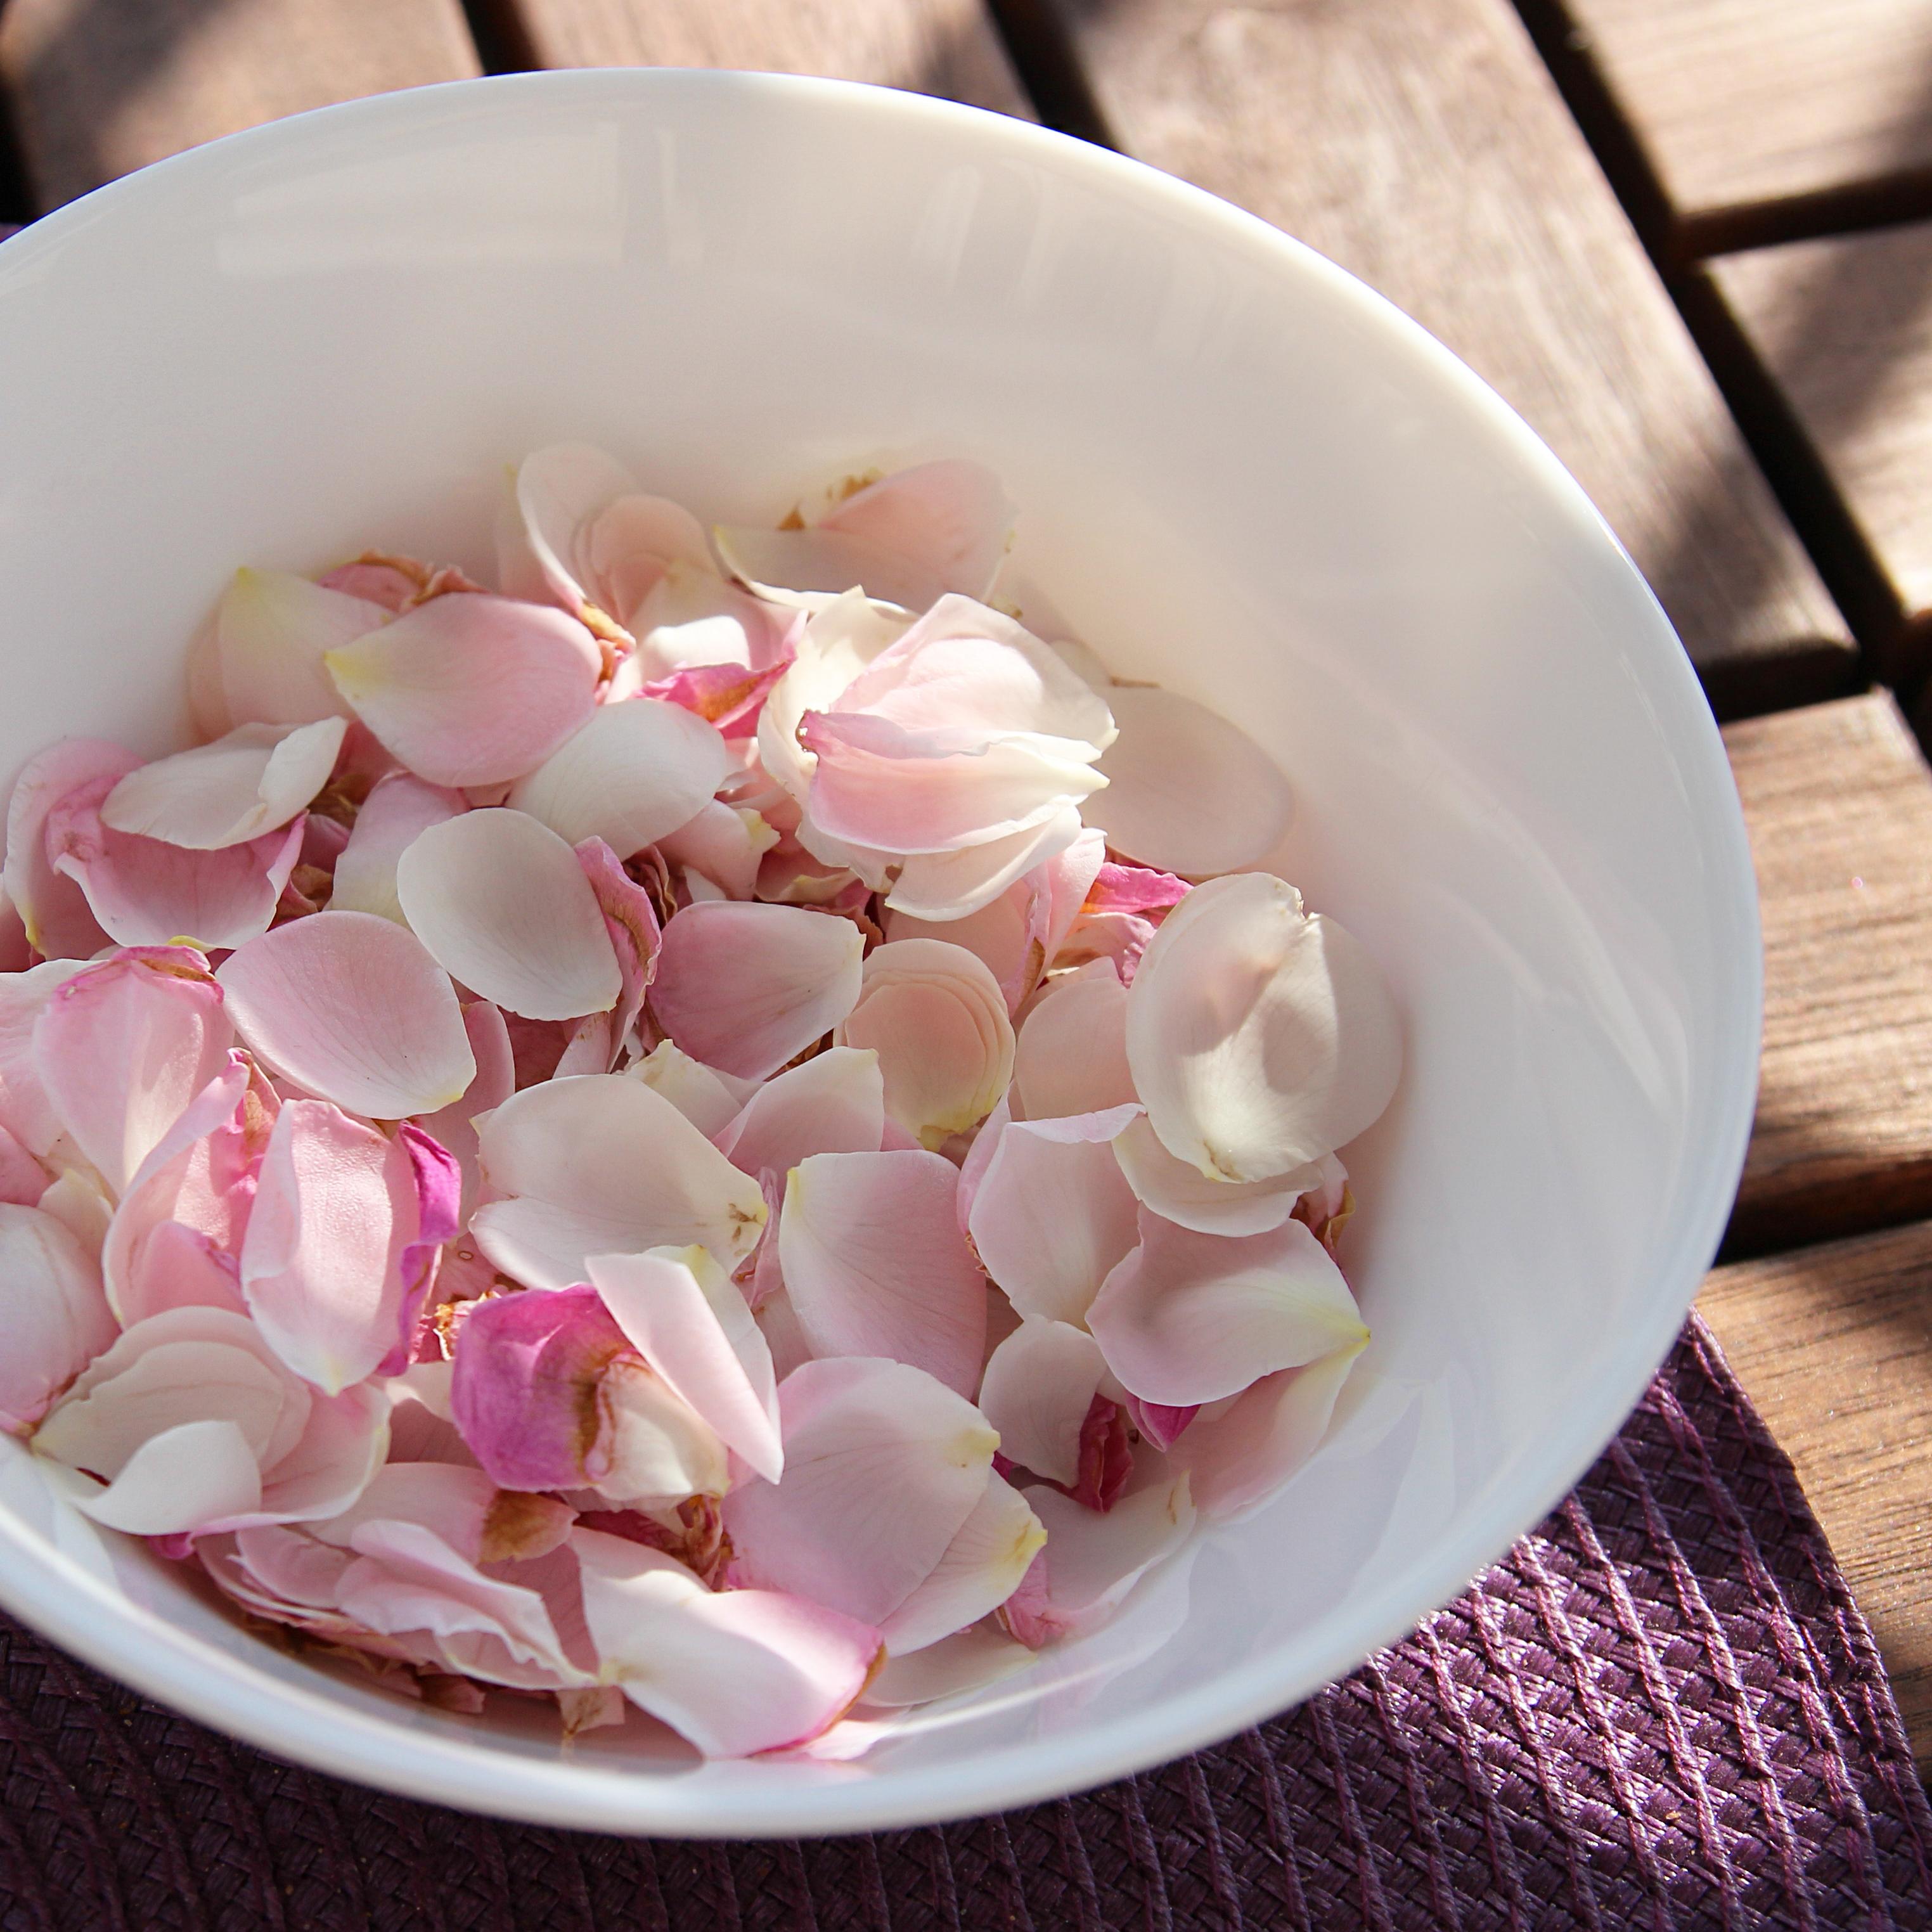 coupelle de pétales de rose - http://homesweetambre.com/